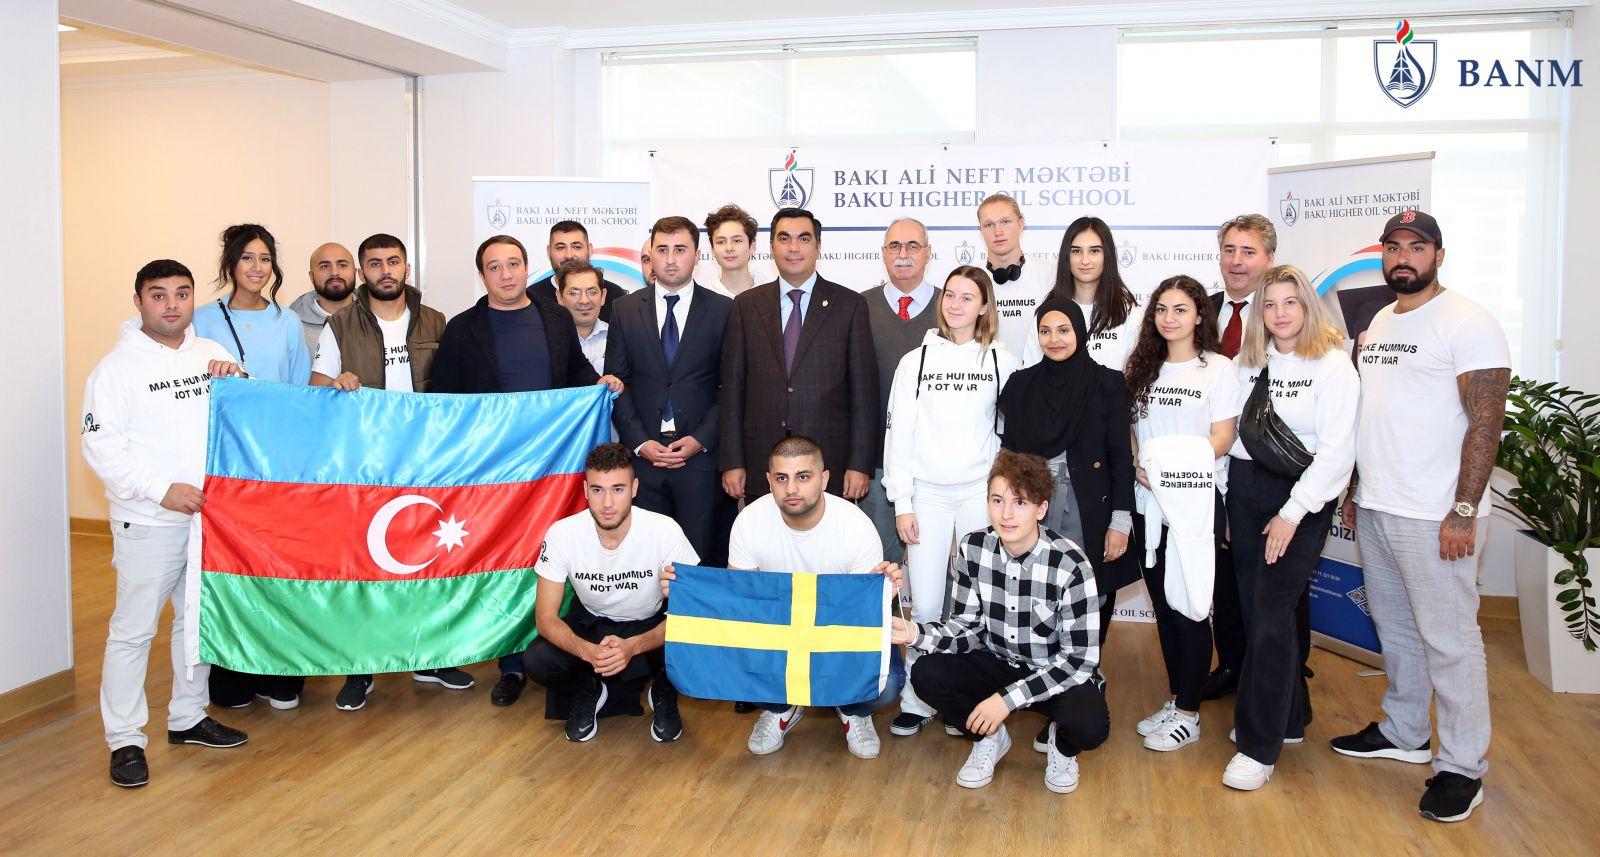 Bhos Representatives Of Swedish Youth Organization Visited Baku Higher Oil School